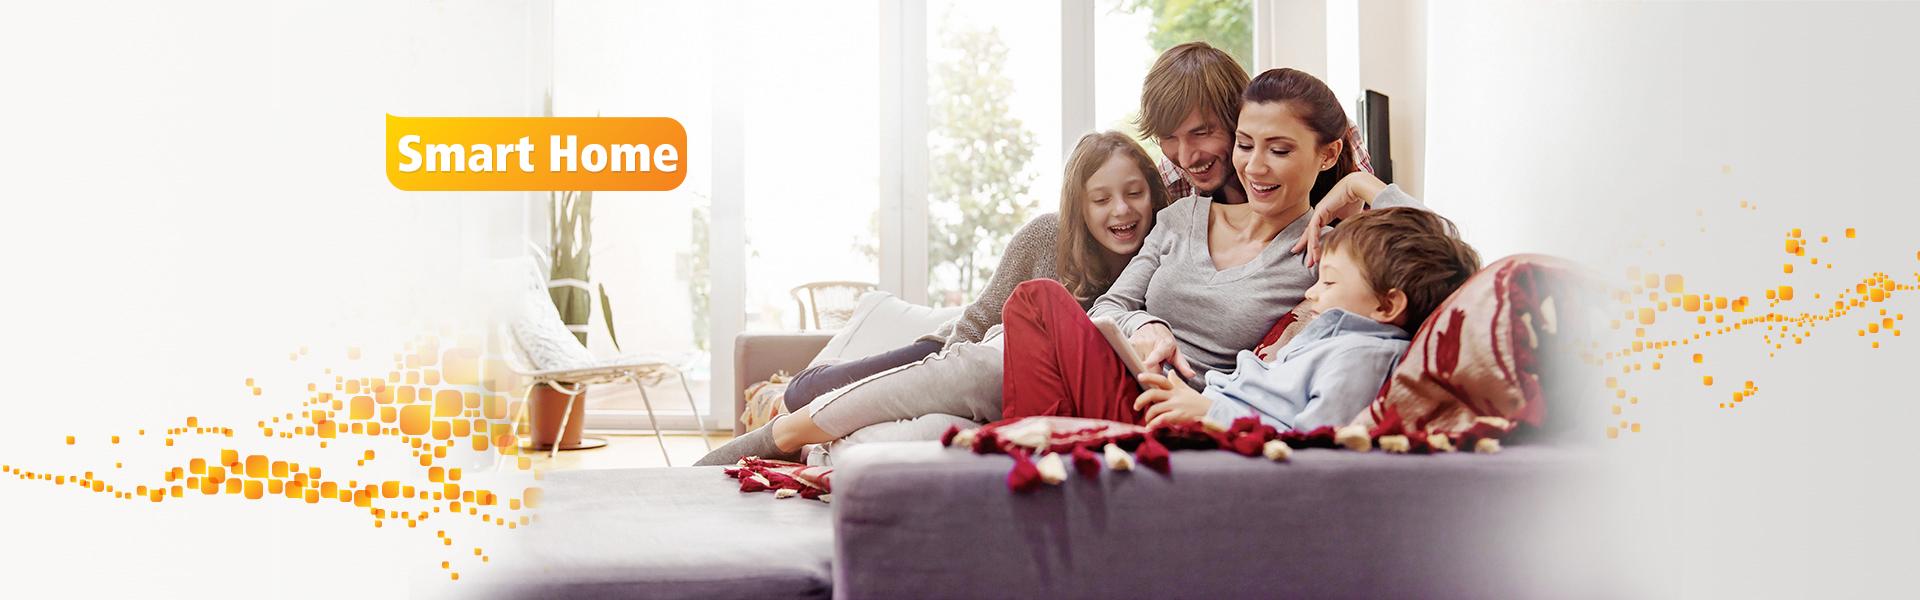 smart home آموزش آموزش خانه هوشمند 5993b9411a205